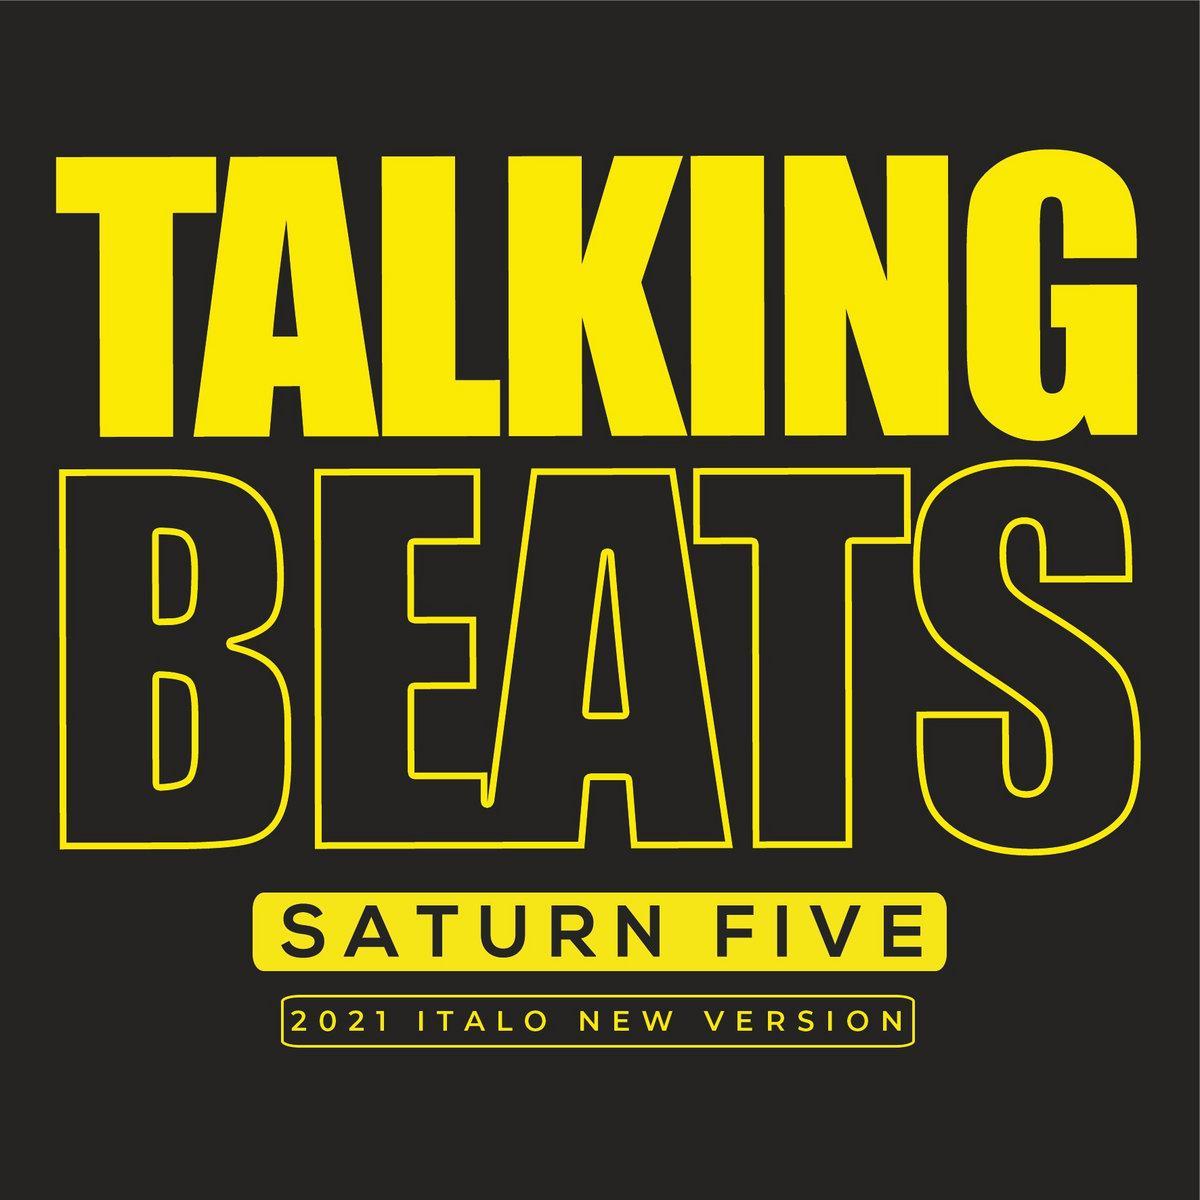 Talking Beats - Saturn Five (Italo New Version)